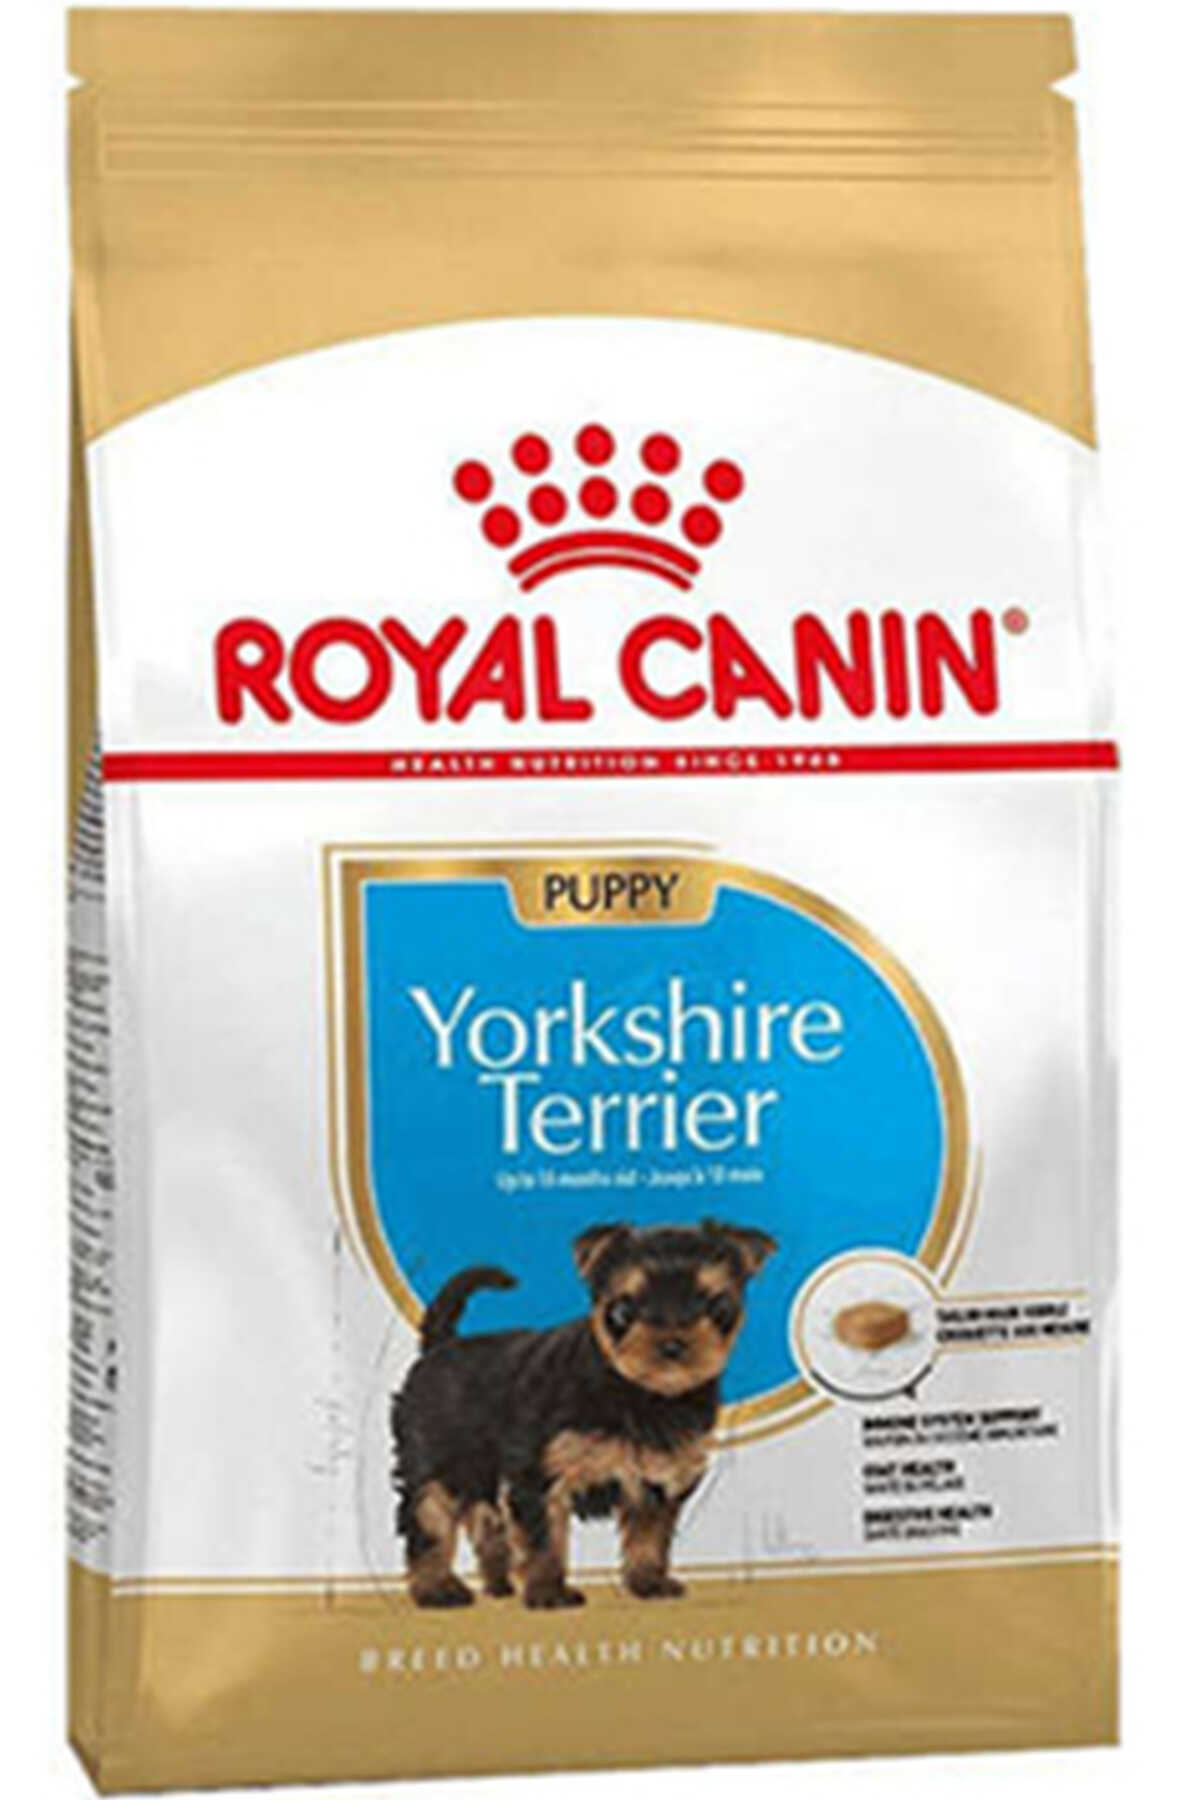 Royal Canin Yorkshire Terrier Puppy Yavru Köpek Maması 1,5kg